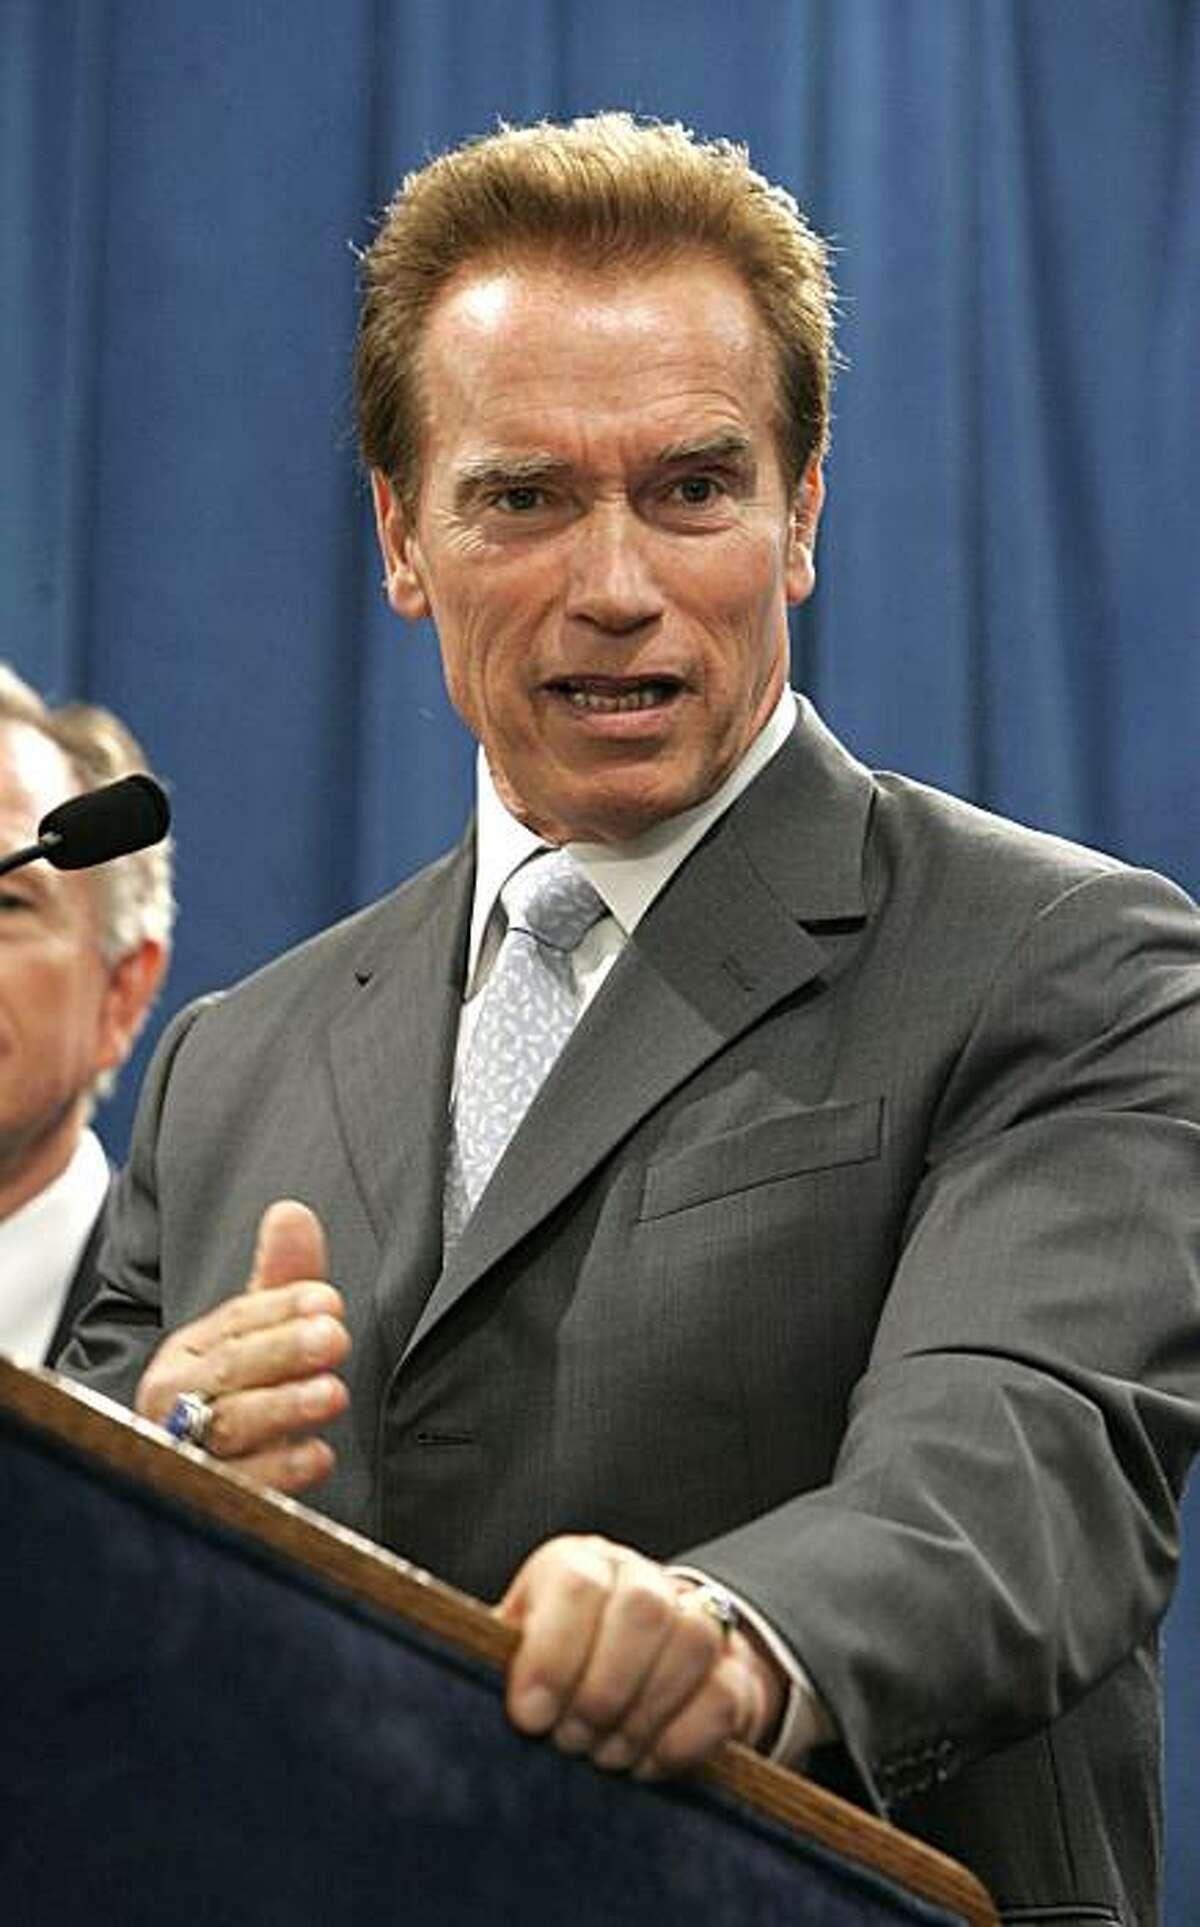 Gov. Arnold Schwarzenegger during a Capitol news conference in Sacramento, Calif., Thursday, Aug. 20, 2009.(AP Photo/Rich Pedroncelli)